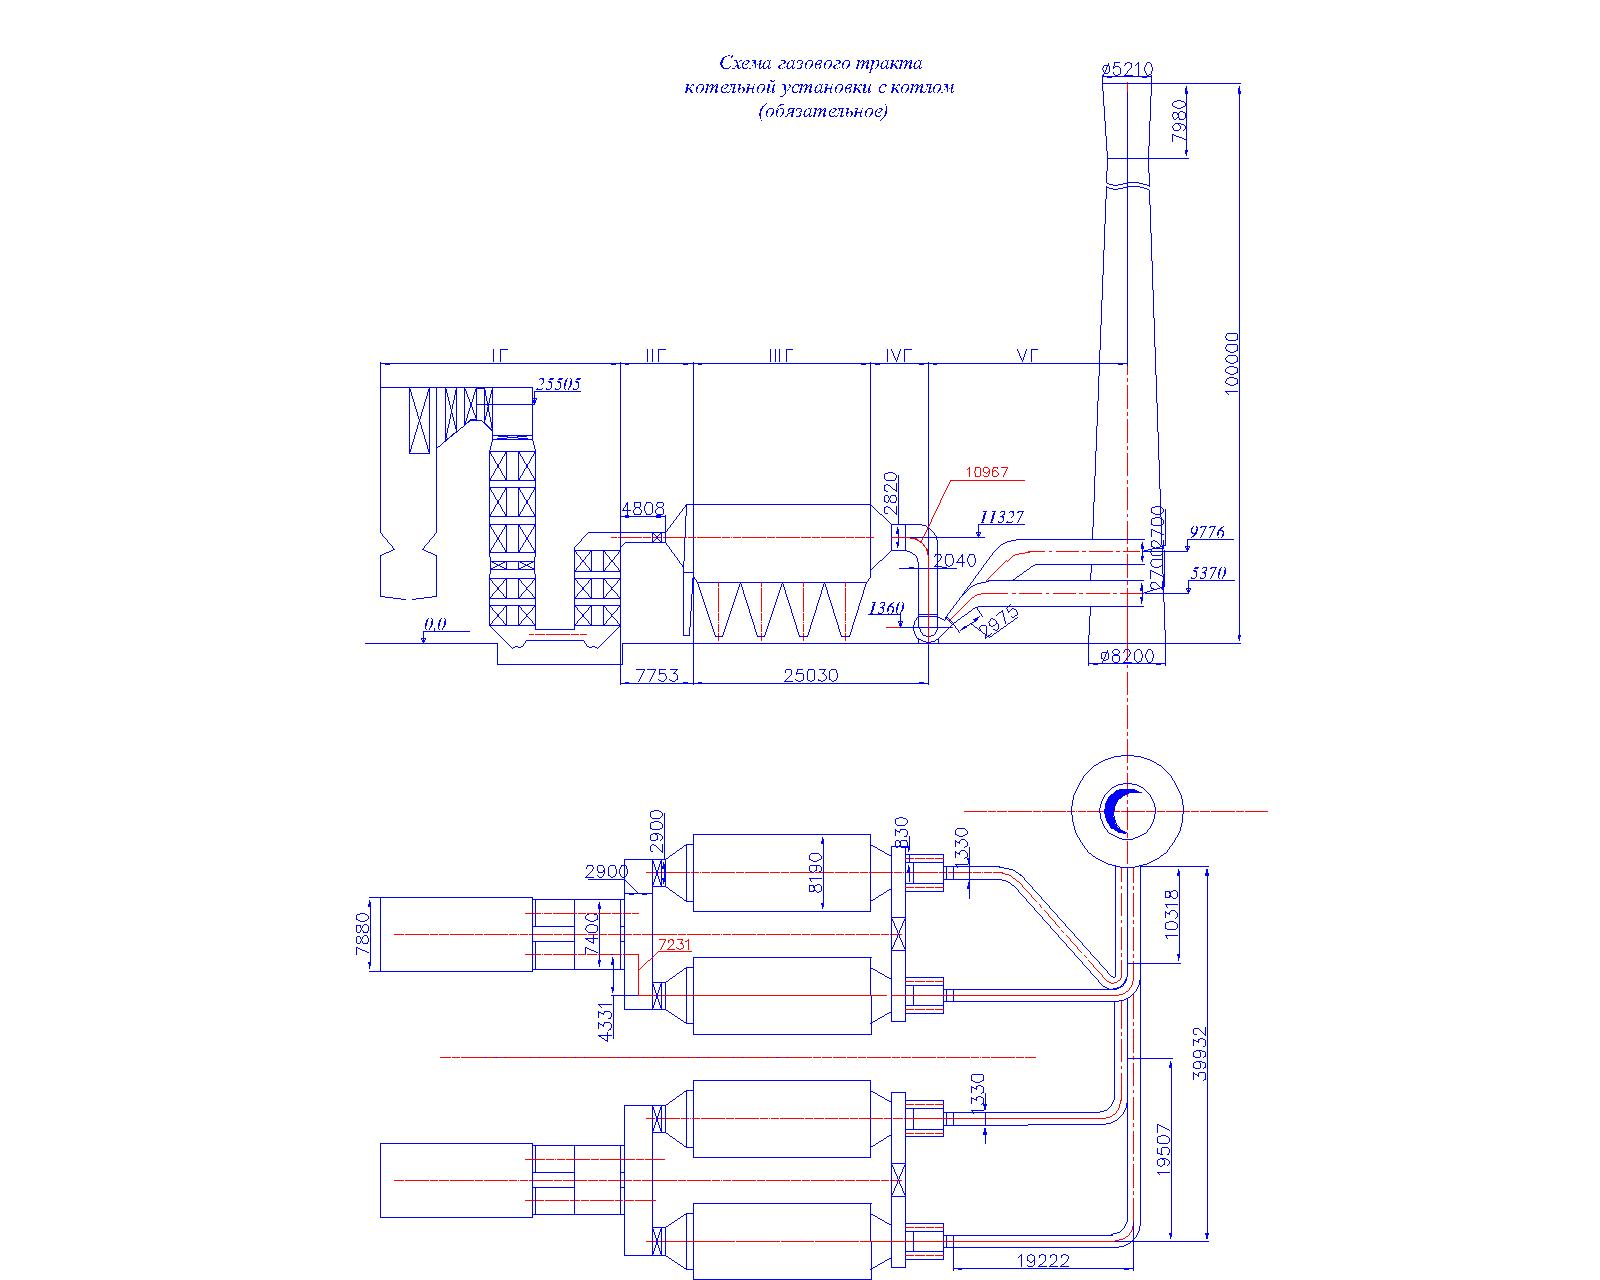 ТНН-Model